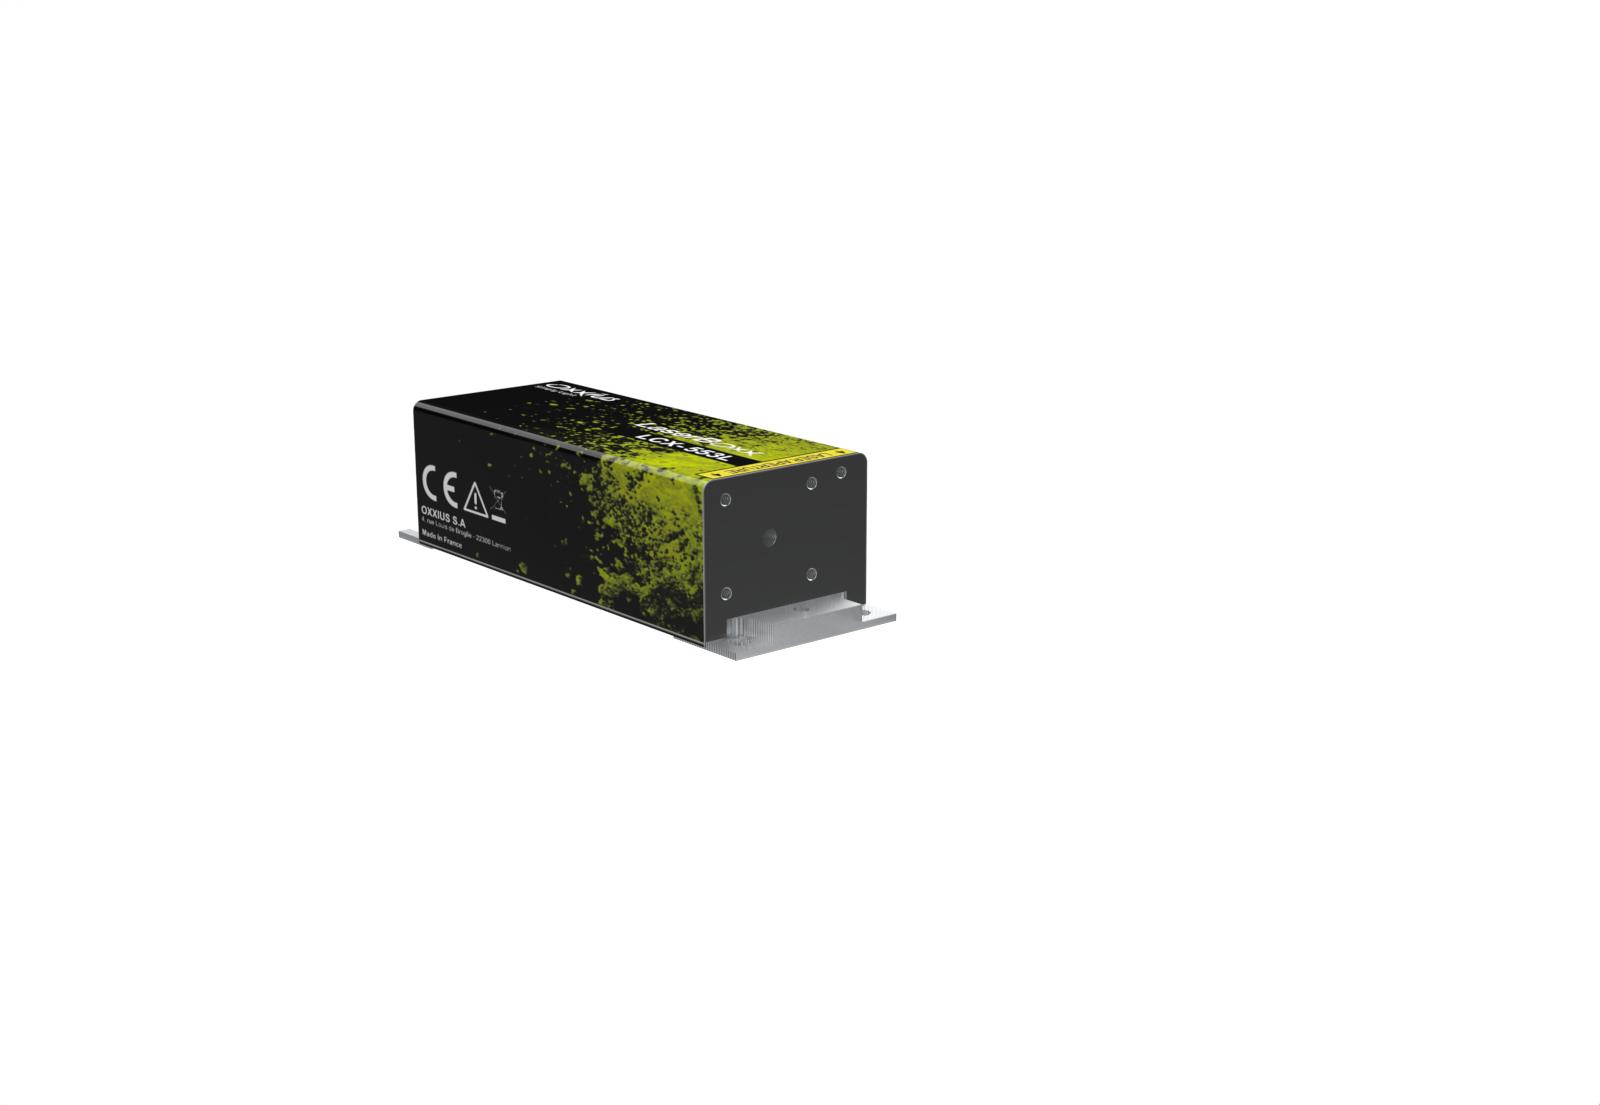 LCX-553S-100-COL: 553nm SLM DPSS Laser